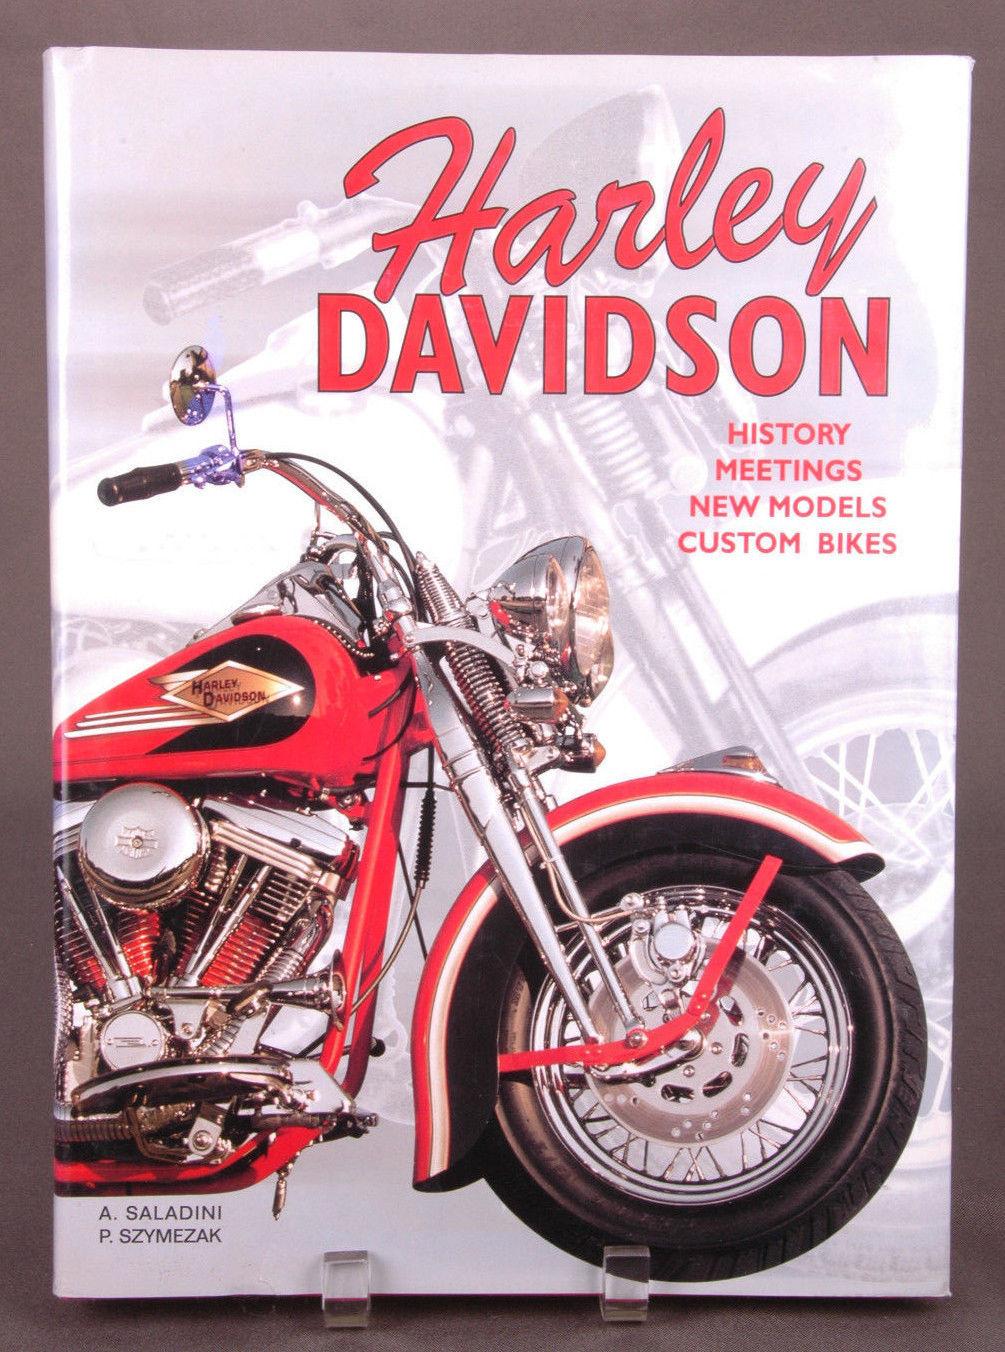 Harley Davidson Hardcover Book-Saladini Szymezak-History Meetings-Motorcycle-Vtg